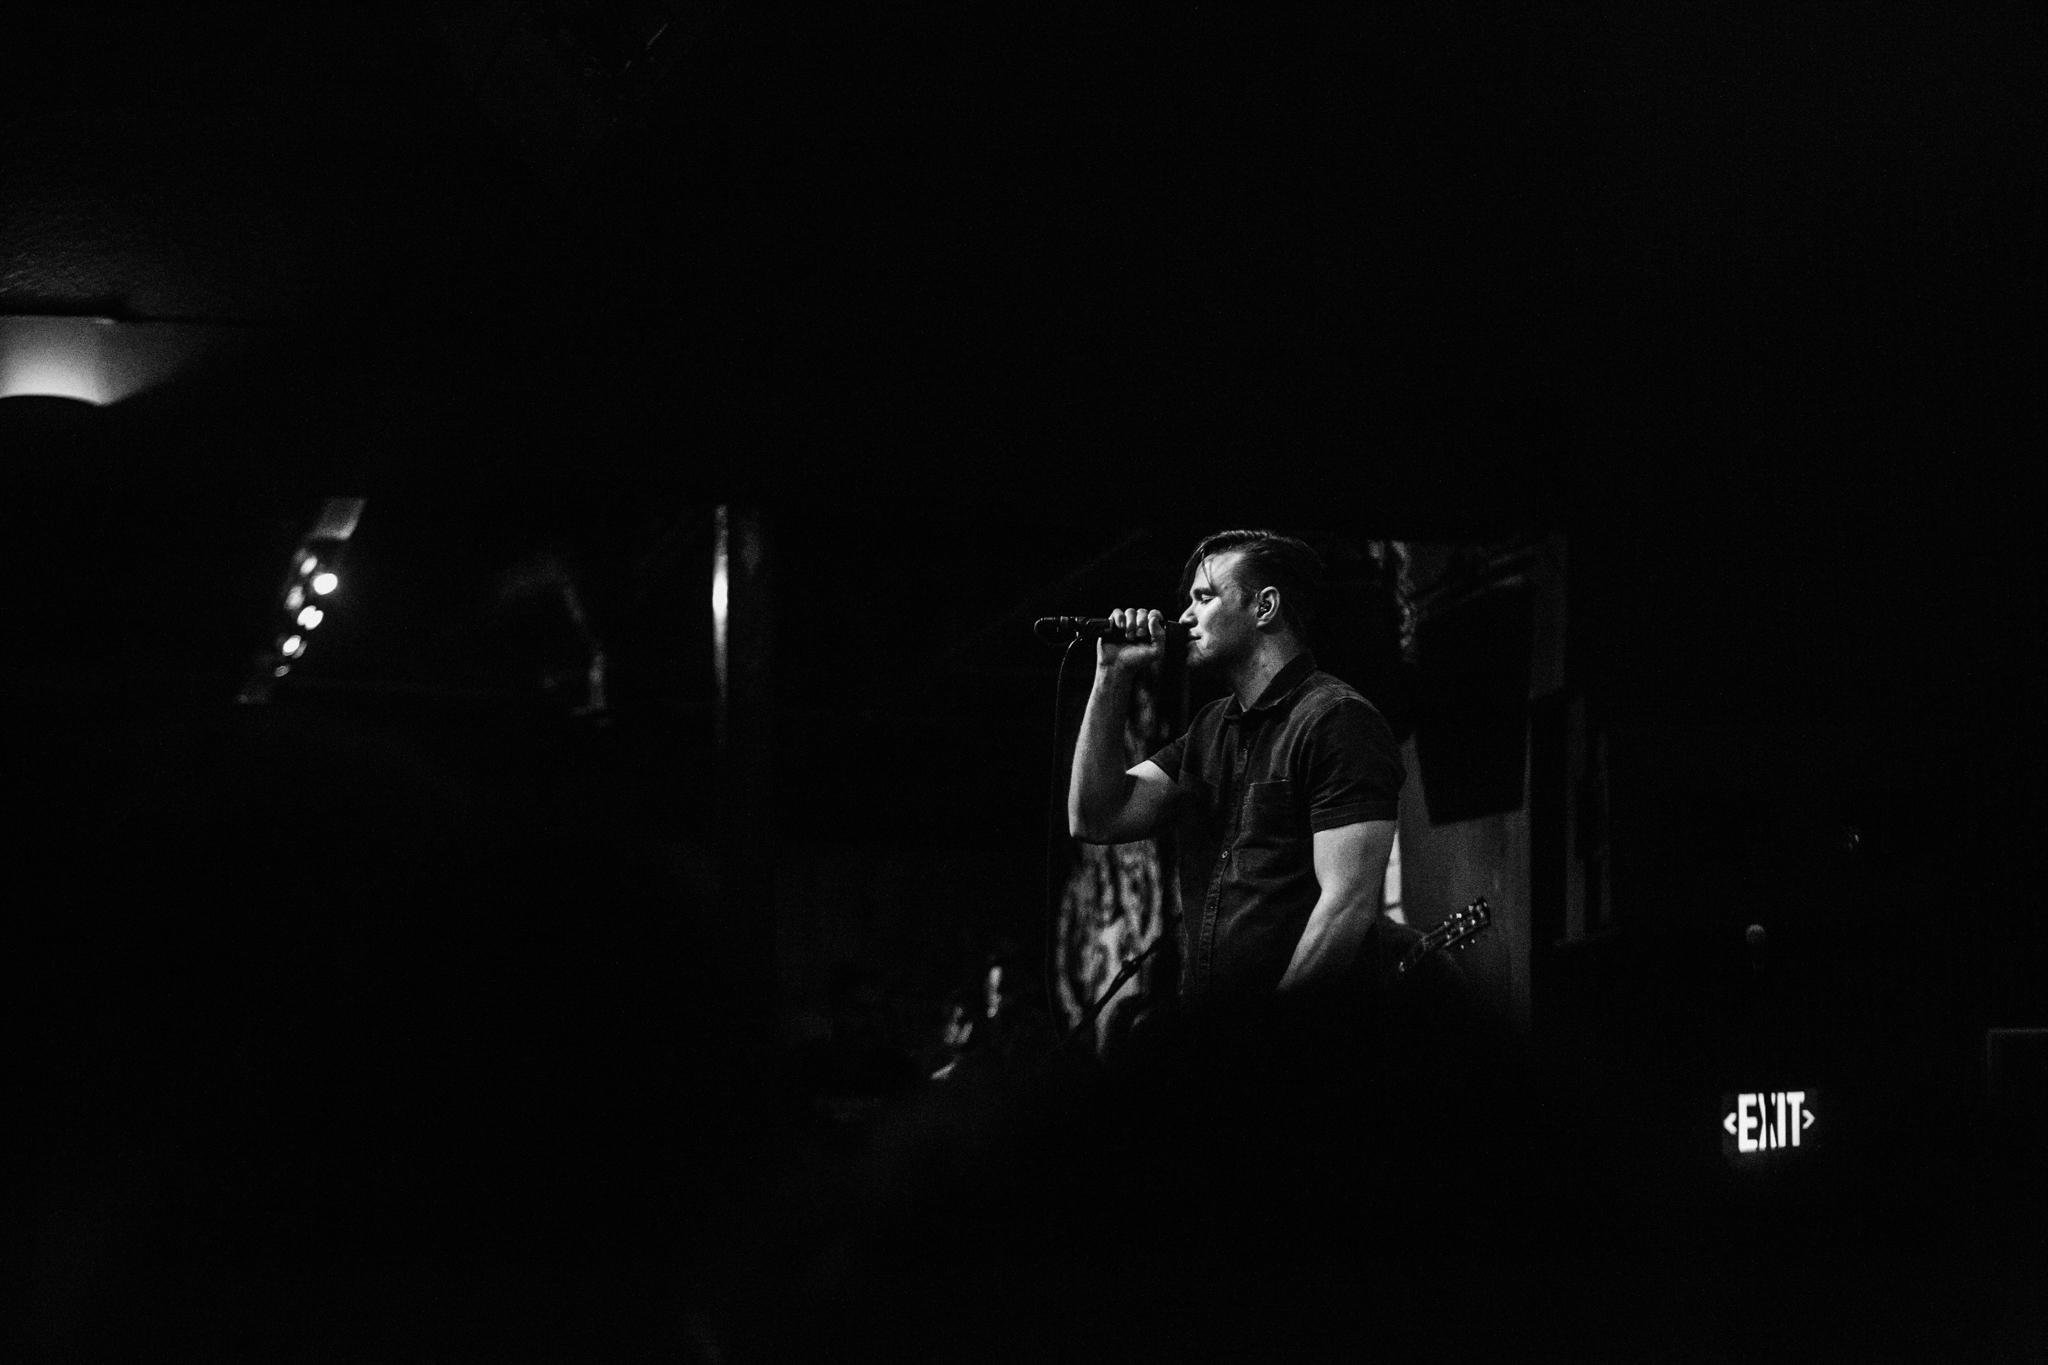 Lafferty Photo - Dance Gavin Dance 03.08.17-8459.jpg